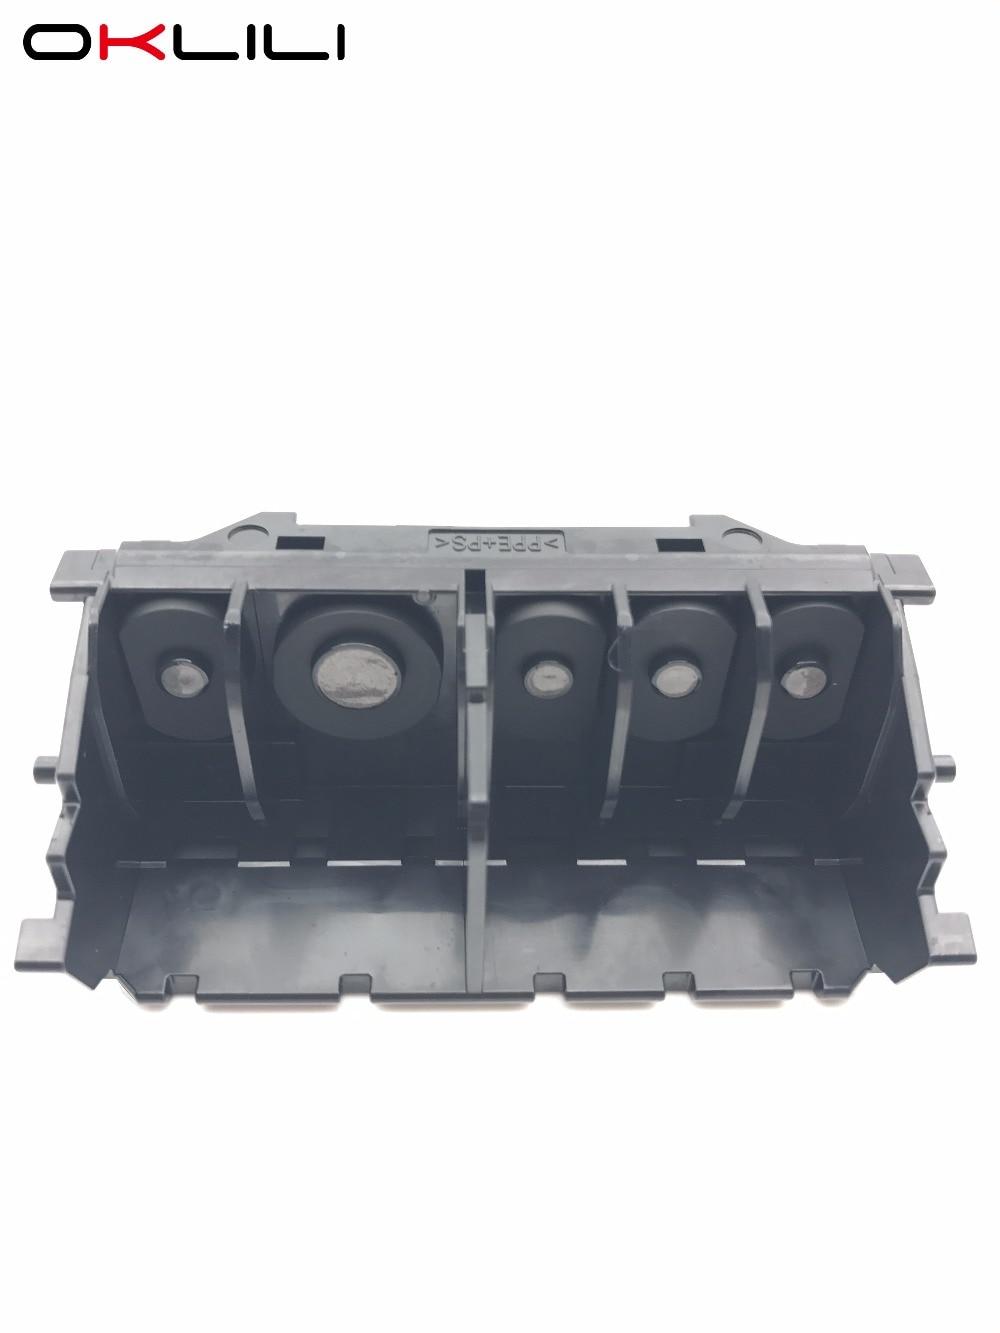 ORIGINAL NEW QY6-0082 QY6-0082-000 Printhead Print Head for Canon iP7220 iP7250 MG5420 MG5450 MG5520 MG5550 MG6420 MG6450 doctor bag